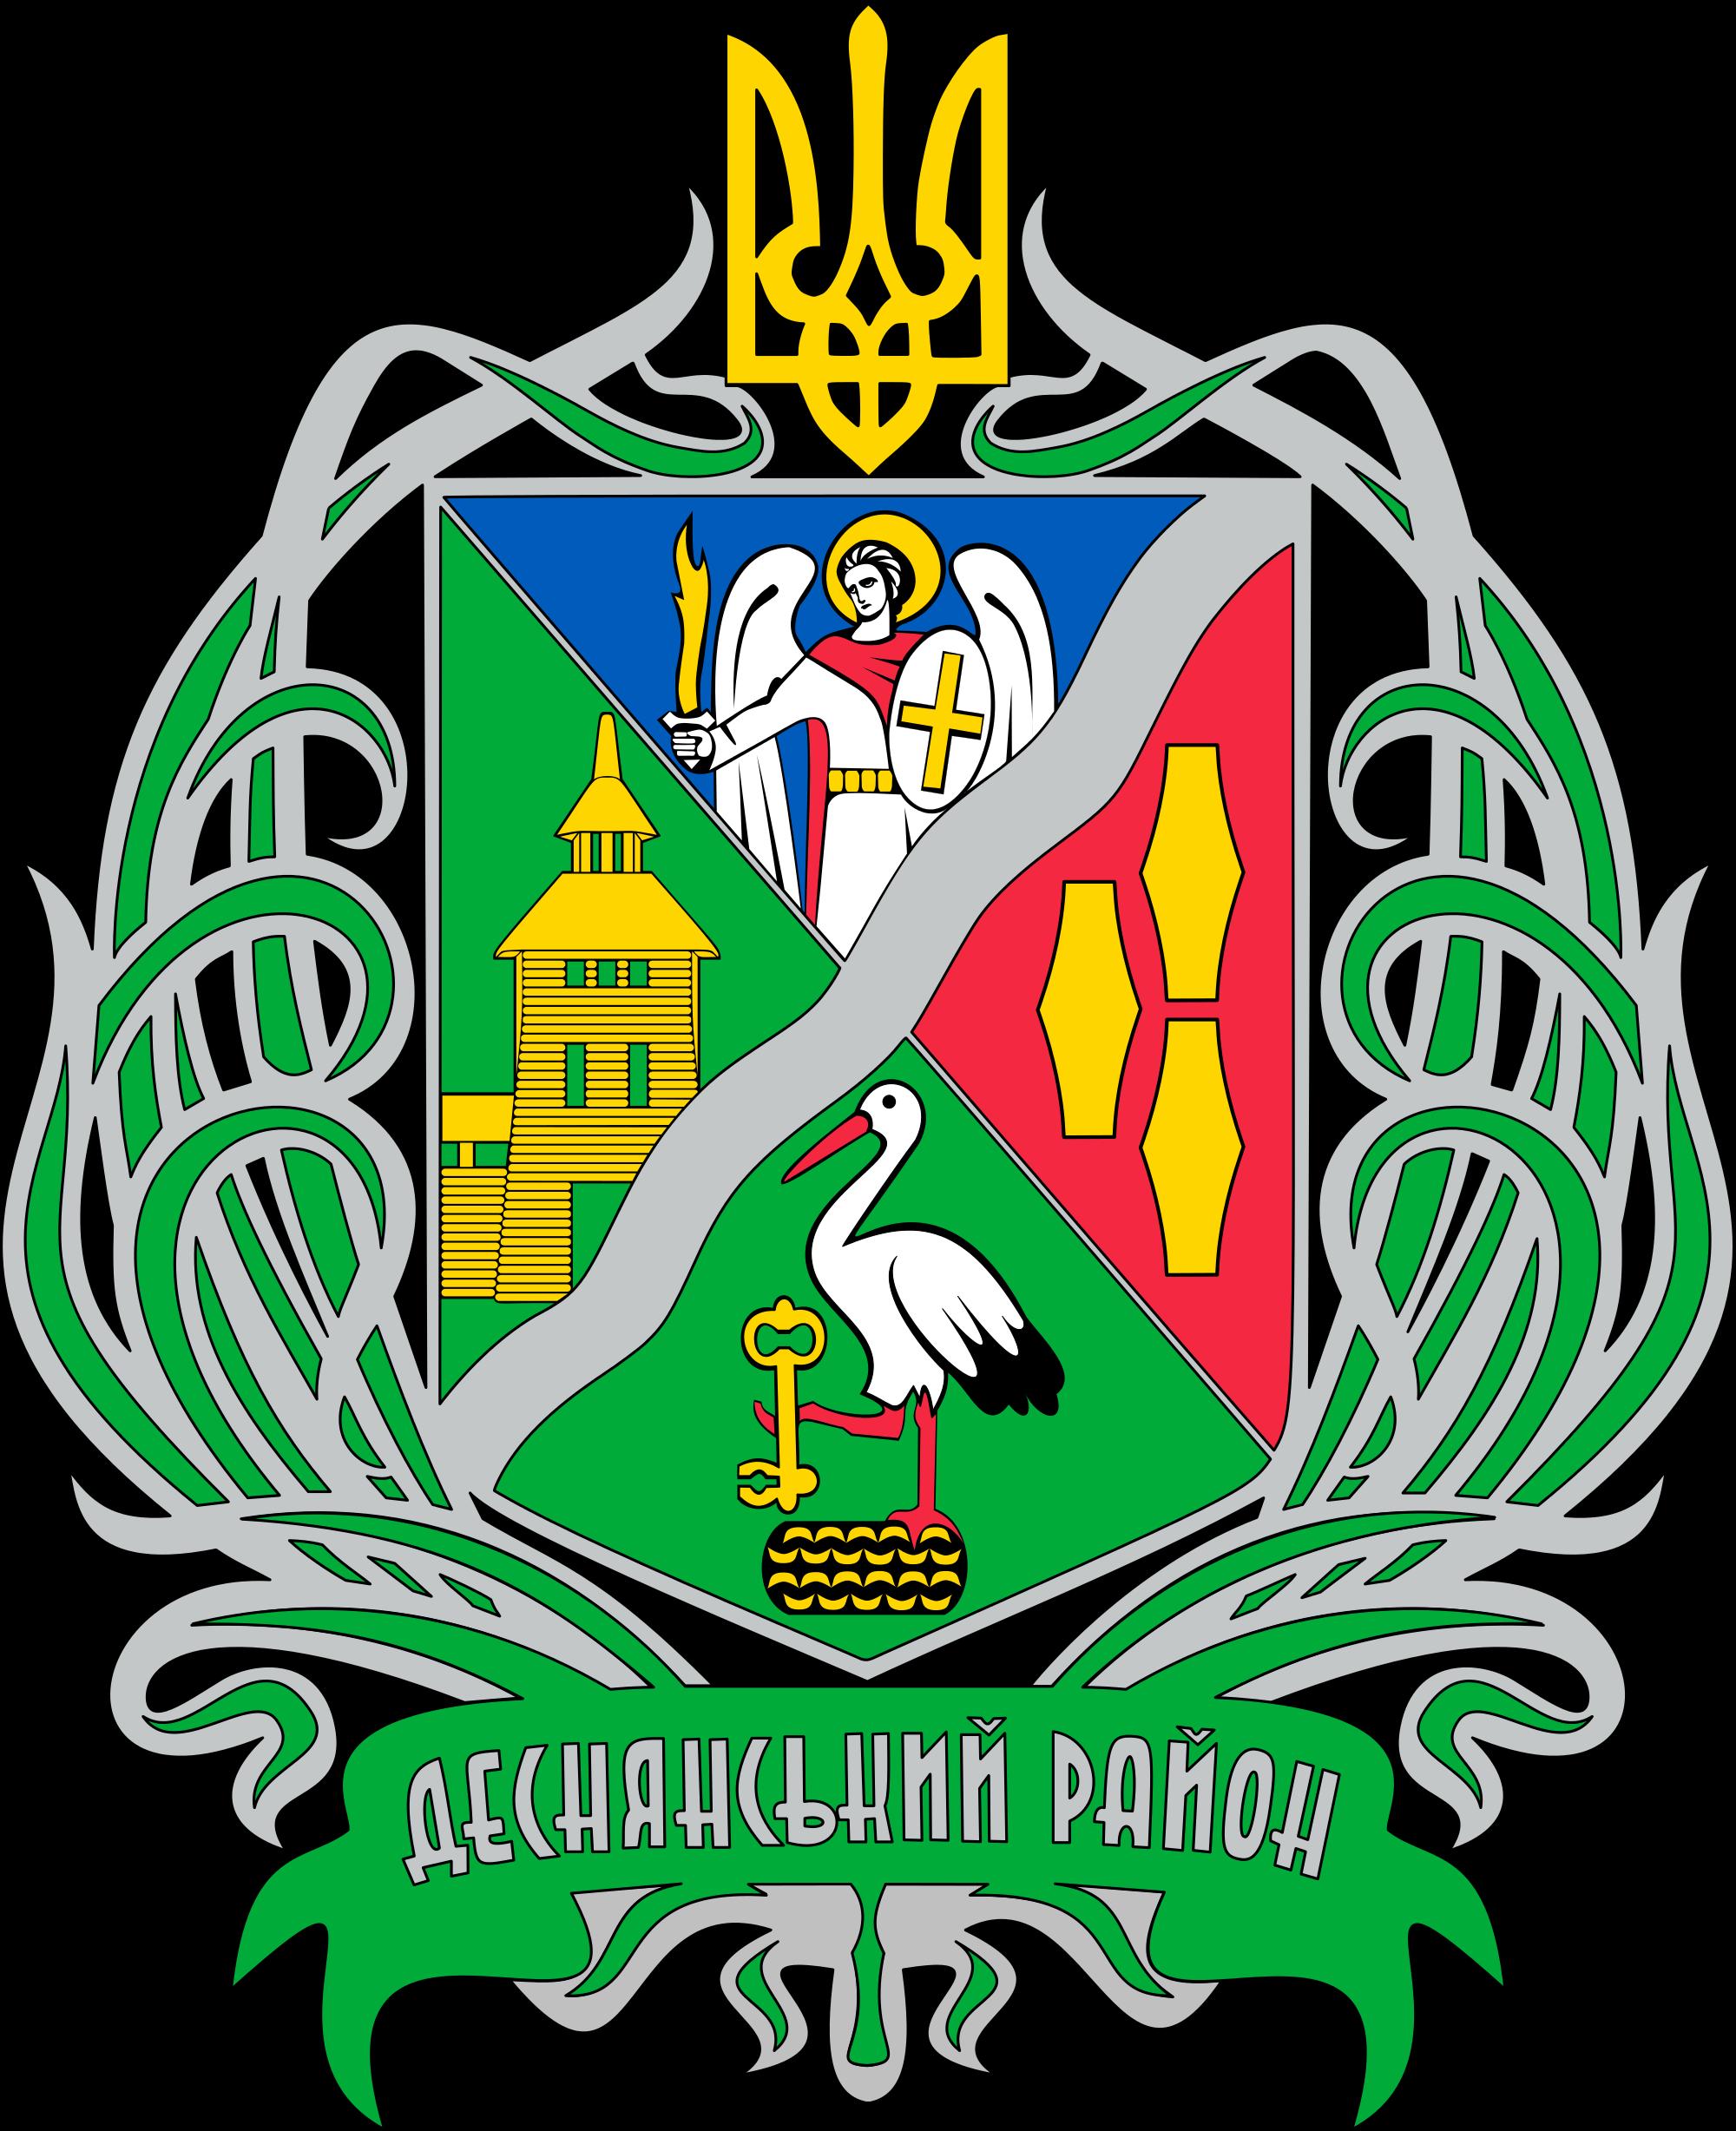 Desna Raion